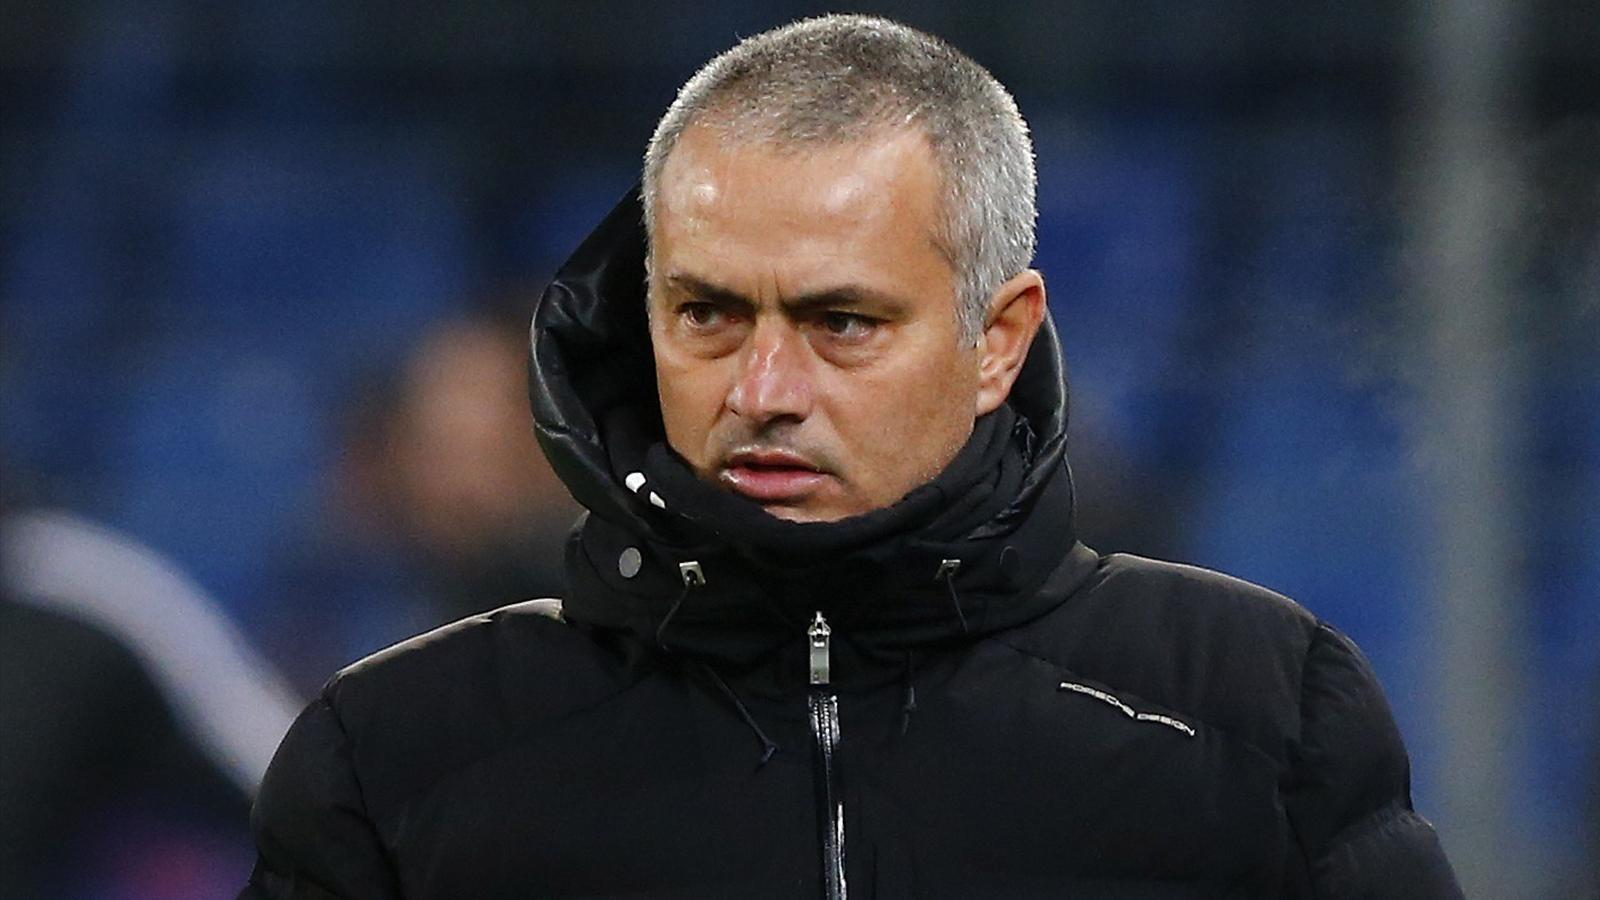 Jose mourinho after the basel defeat reuters